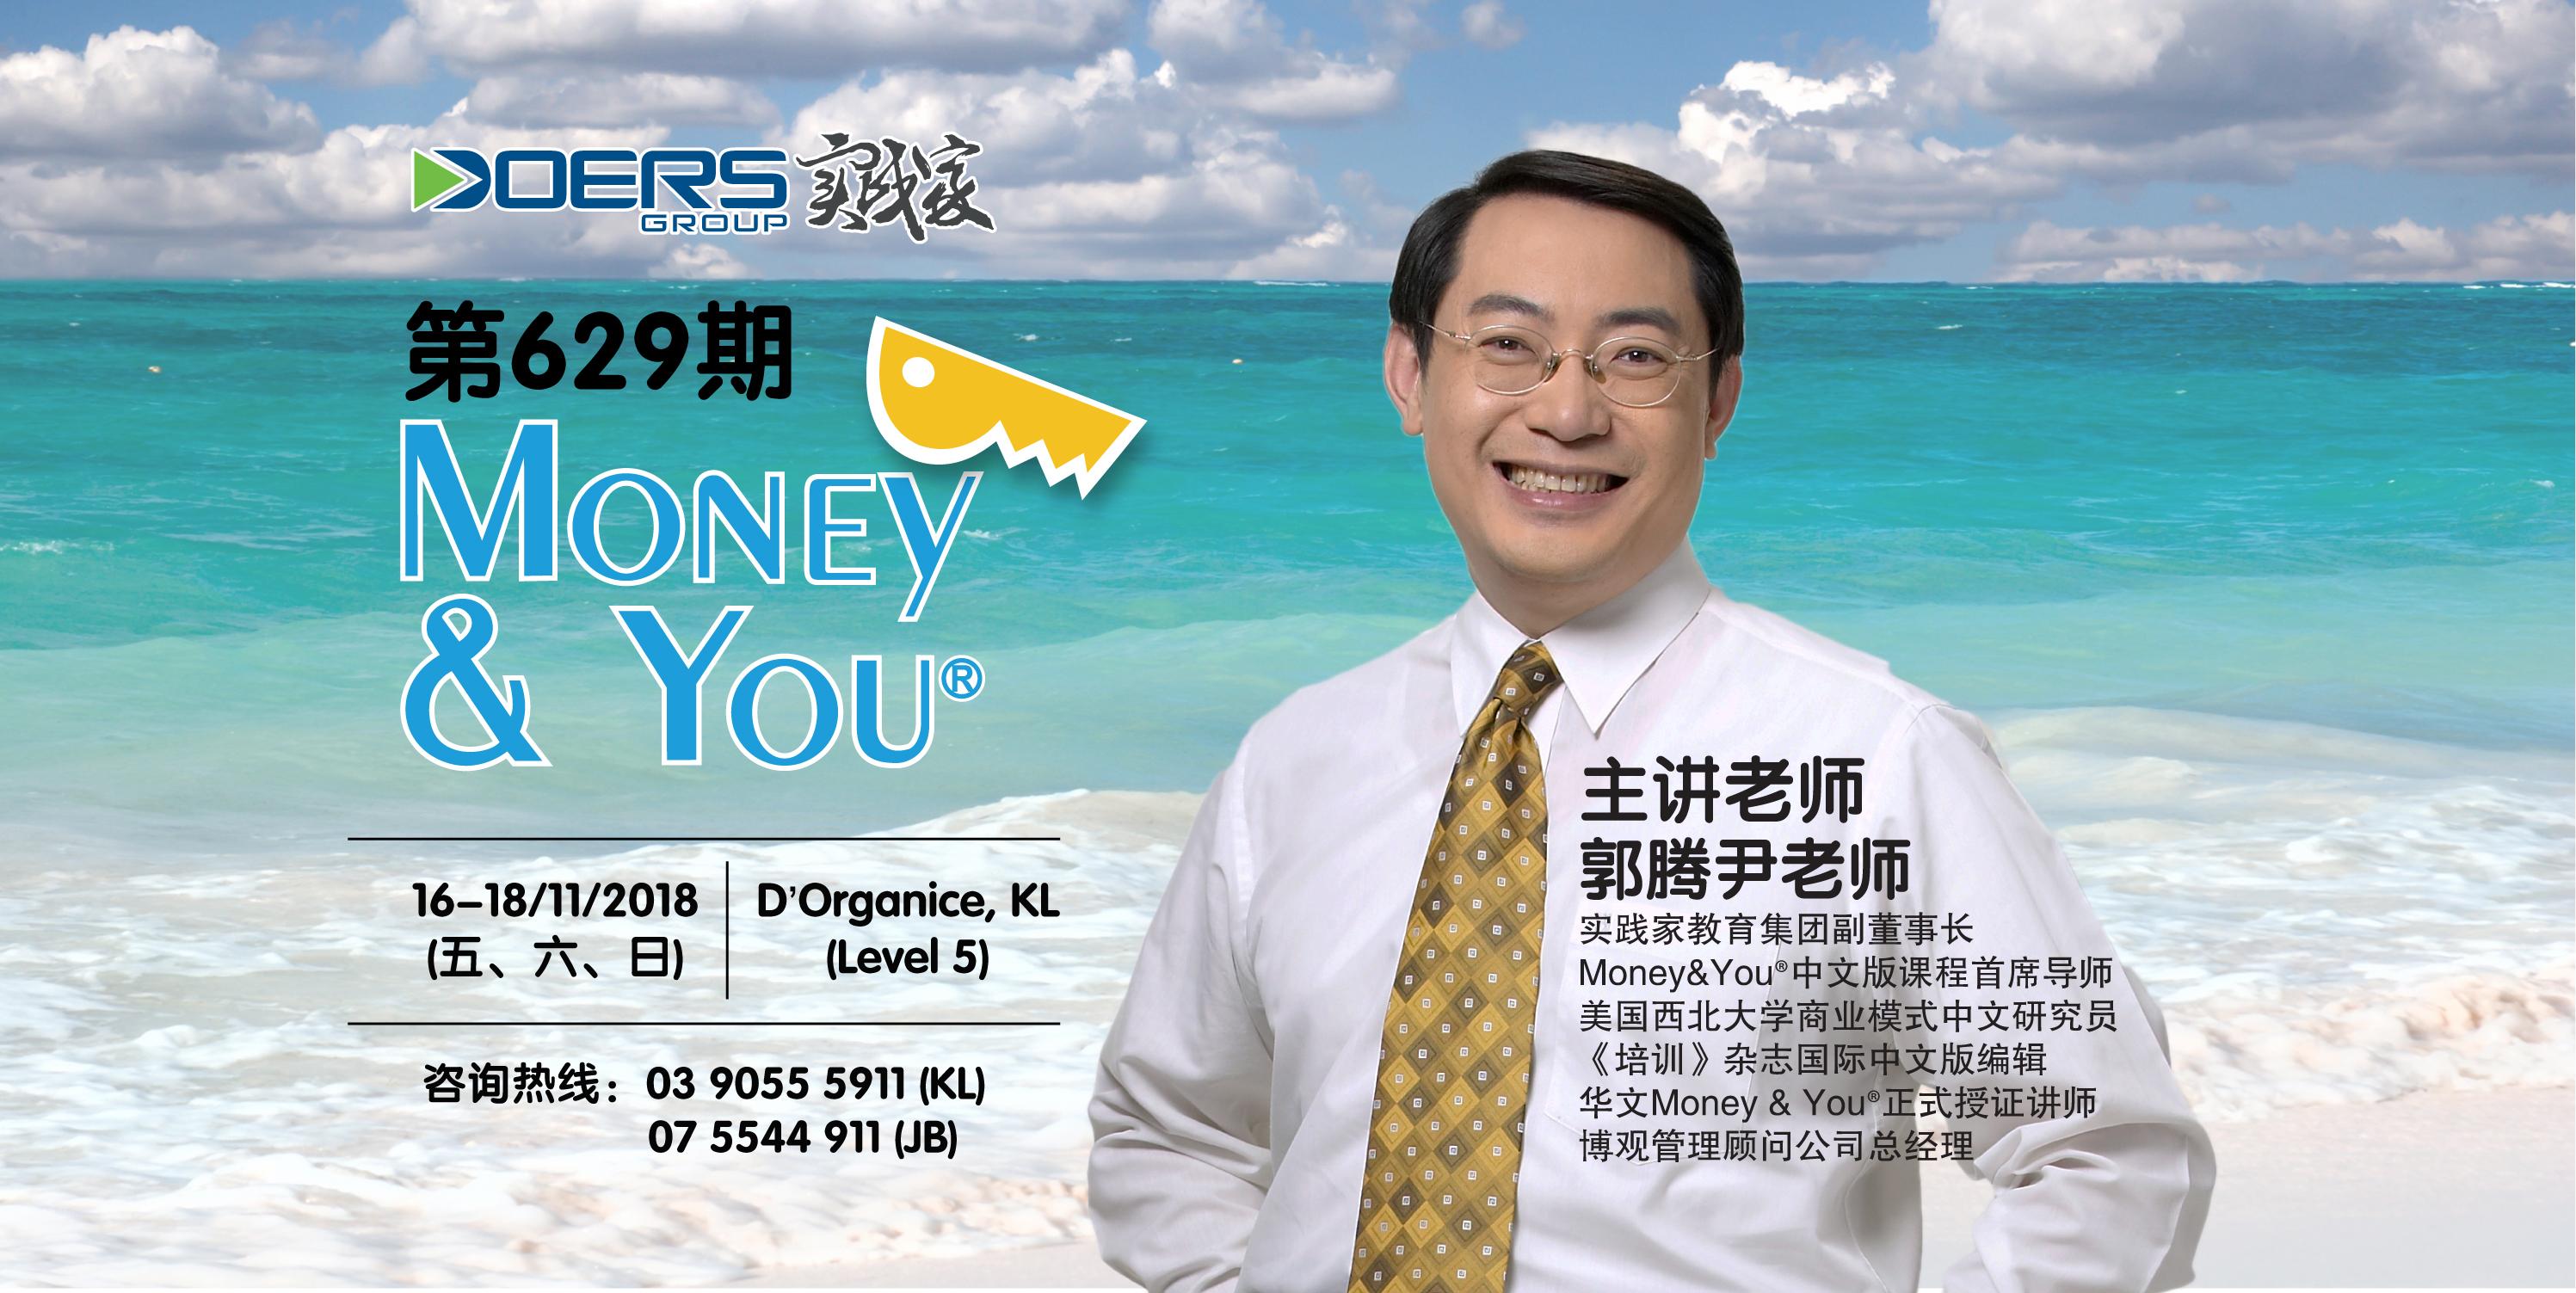 Doers 629 Money & You